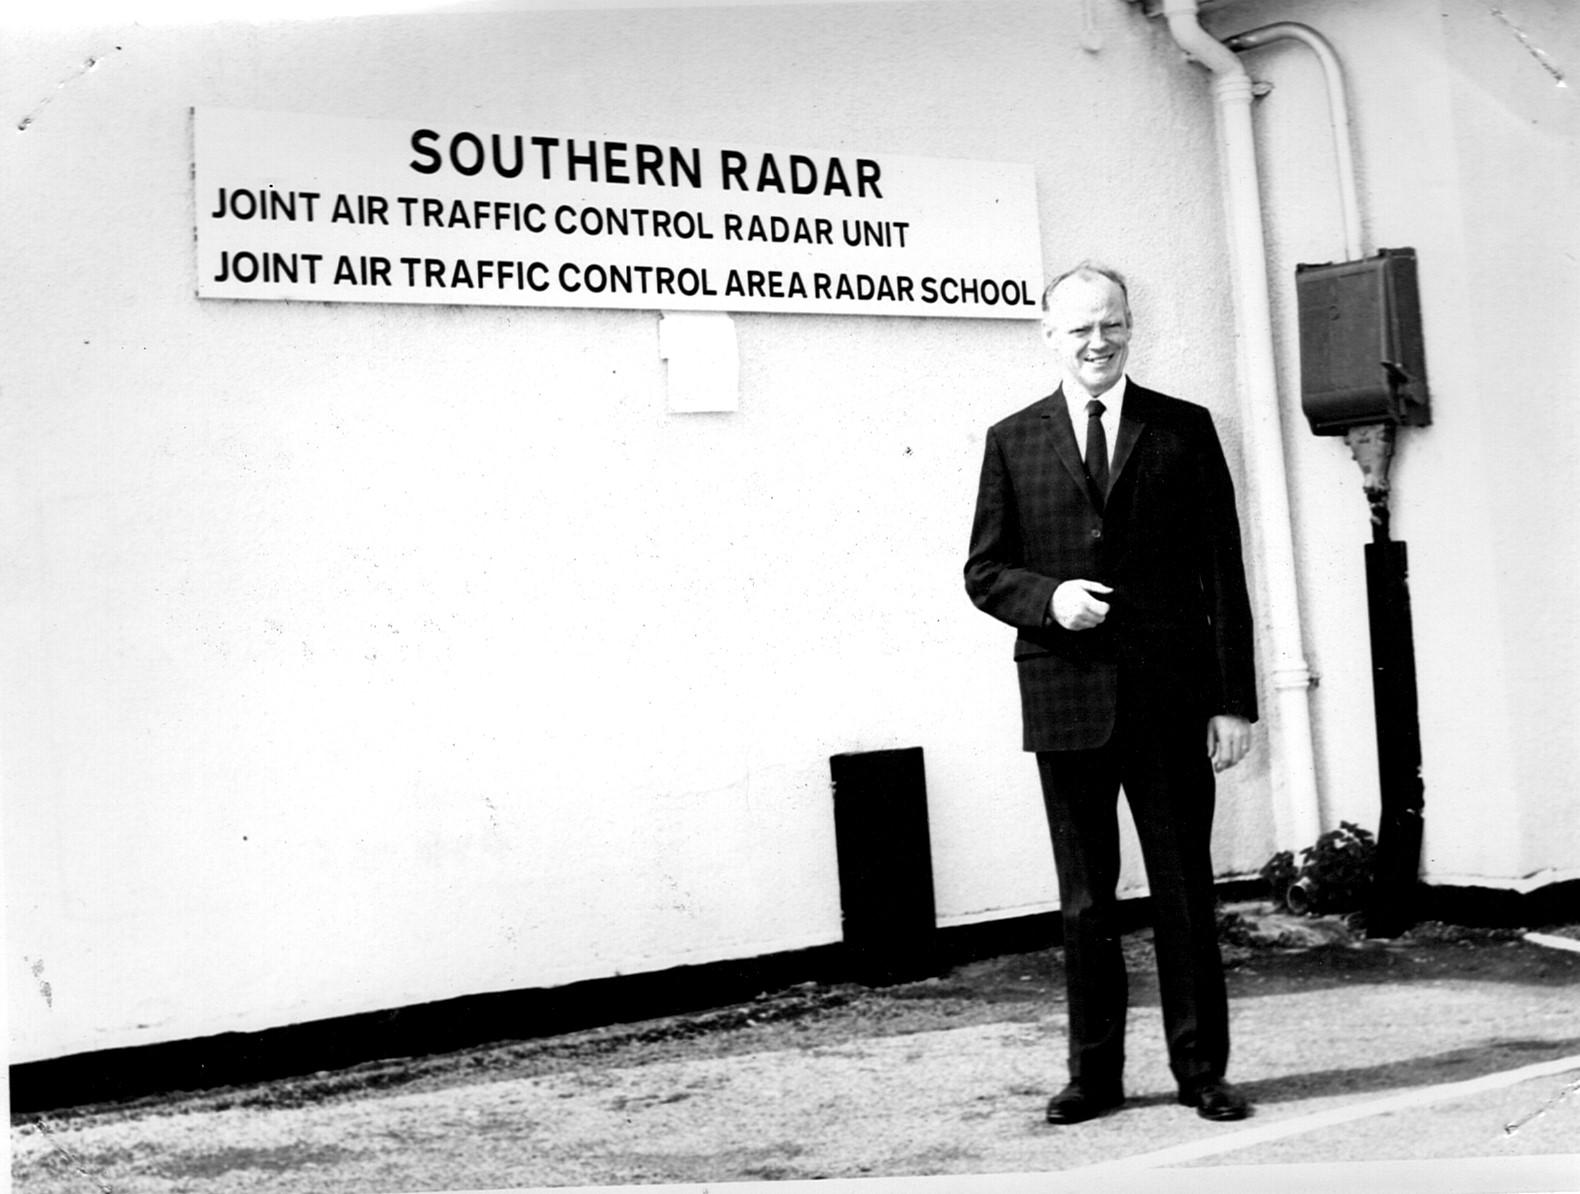 john Dougan Chief Instructor dated 4 10 65